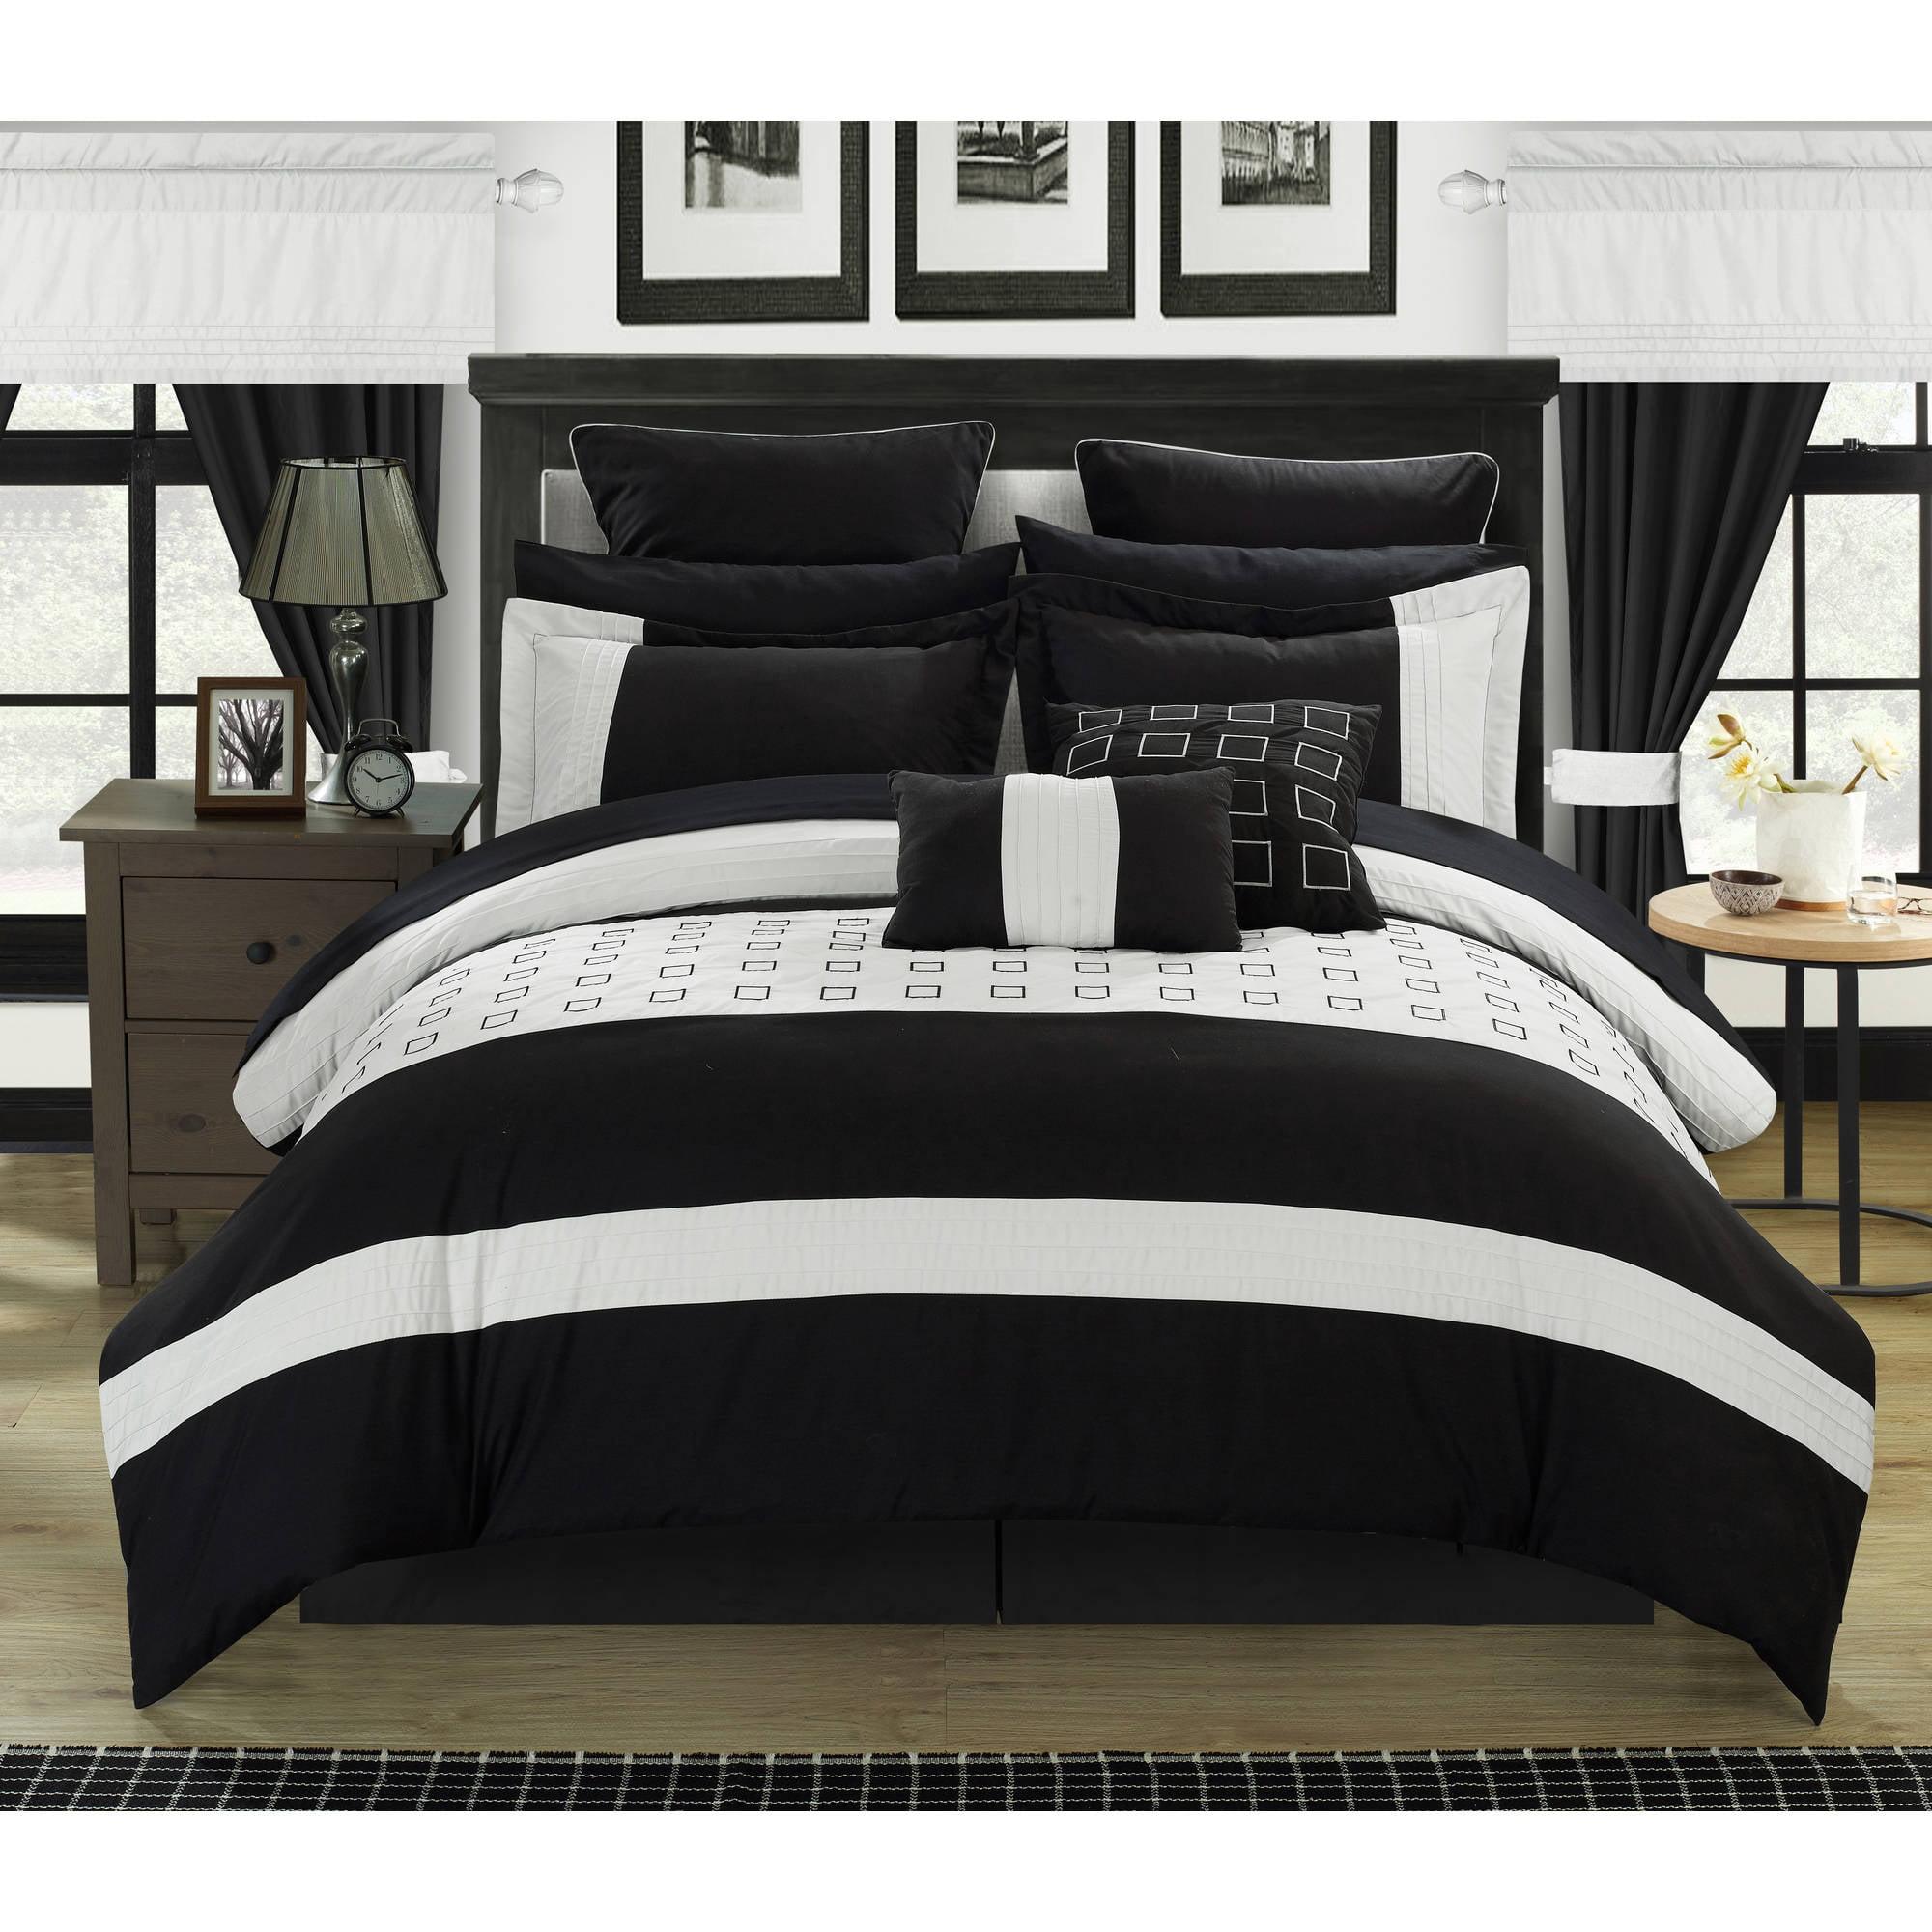 Chic Home Hubert 24-Piece Bed-in-a-Bag Comforter Set